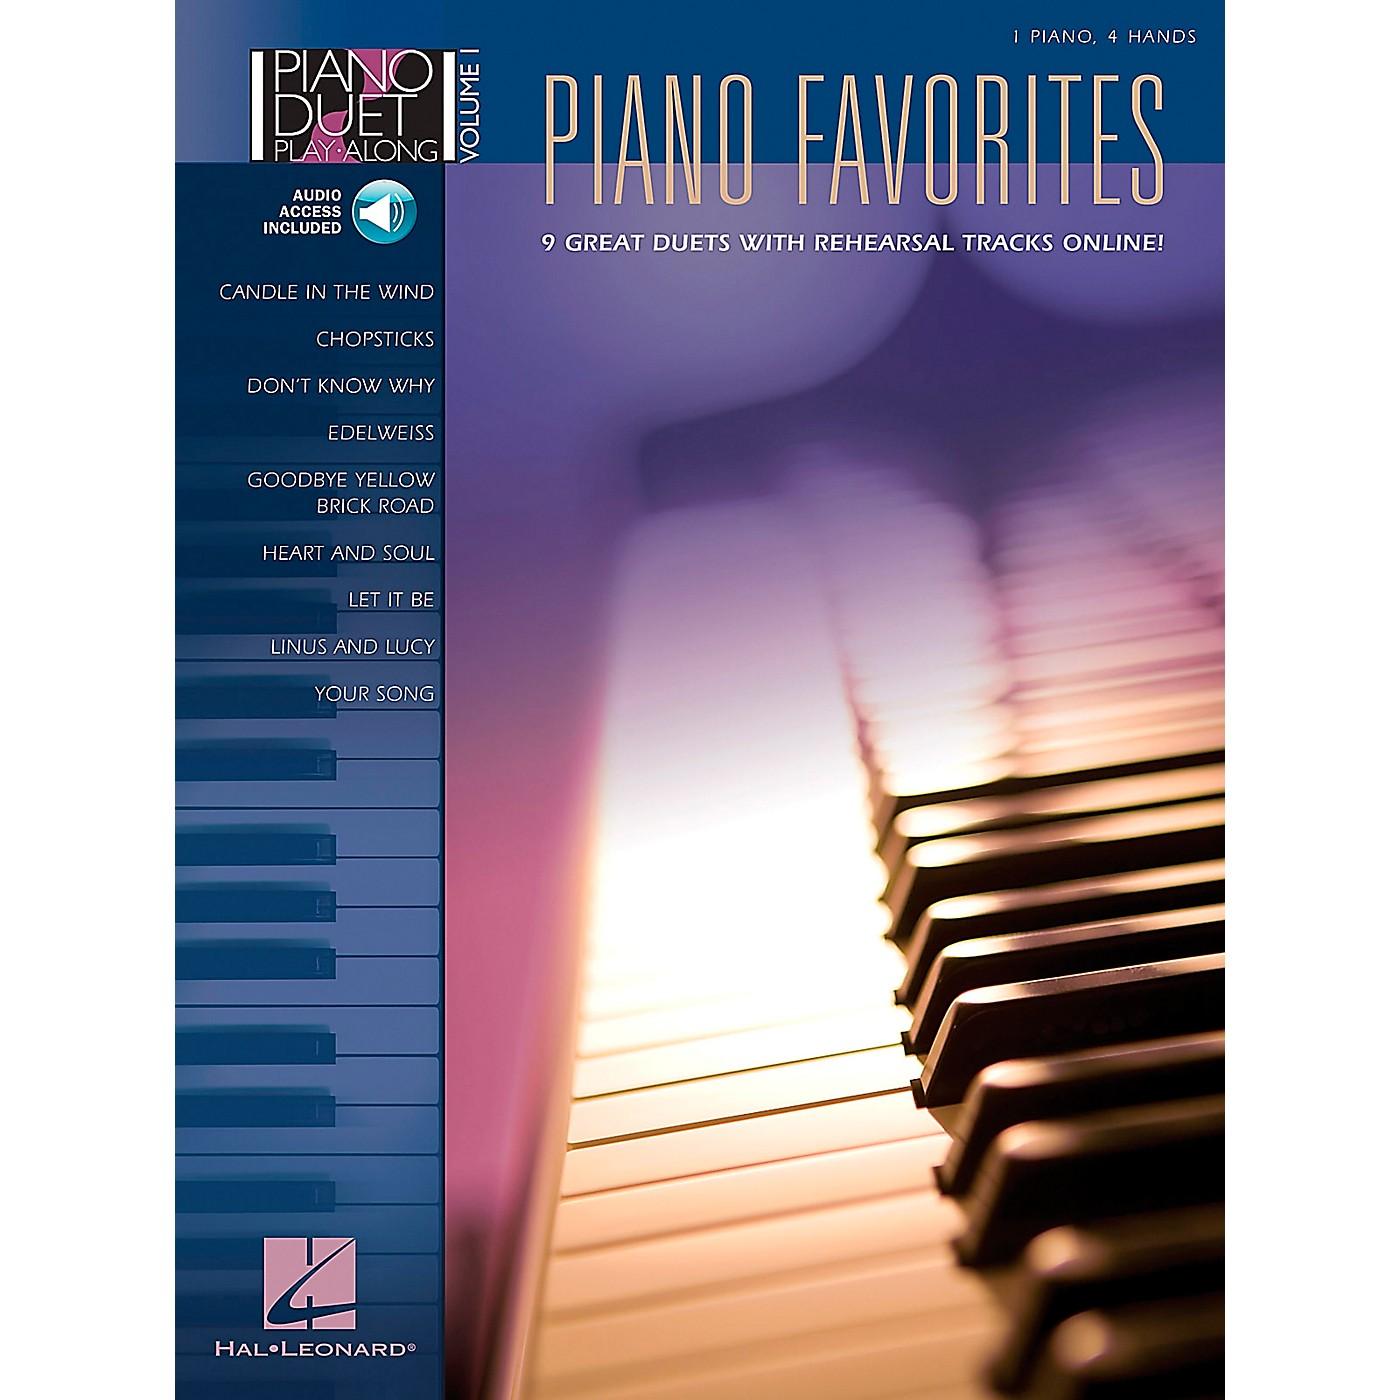 Hal Leonard Piano Favorites Volume 1 Book/CD 1 Piano 4 Hands thumbnail